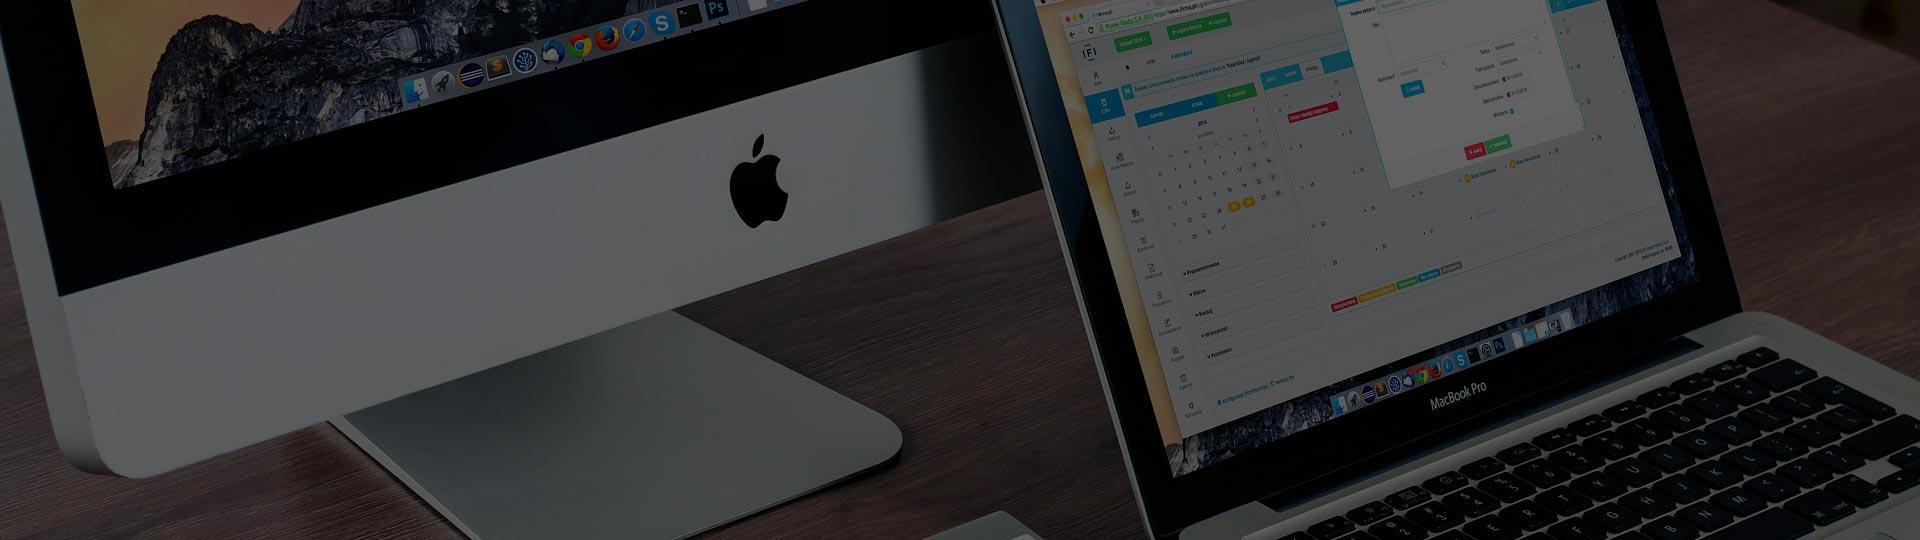 Sviluppo Siti Web Commerciali Novara